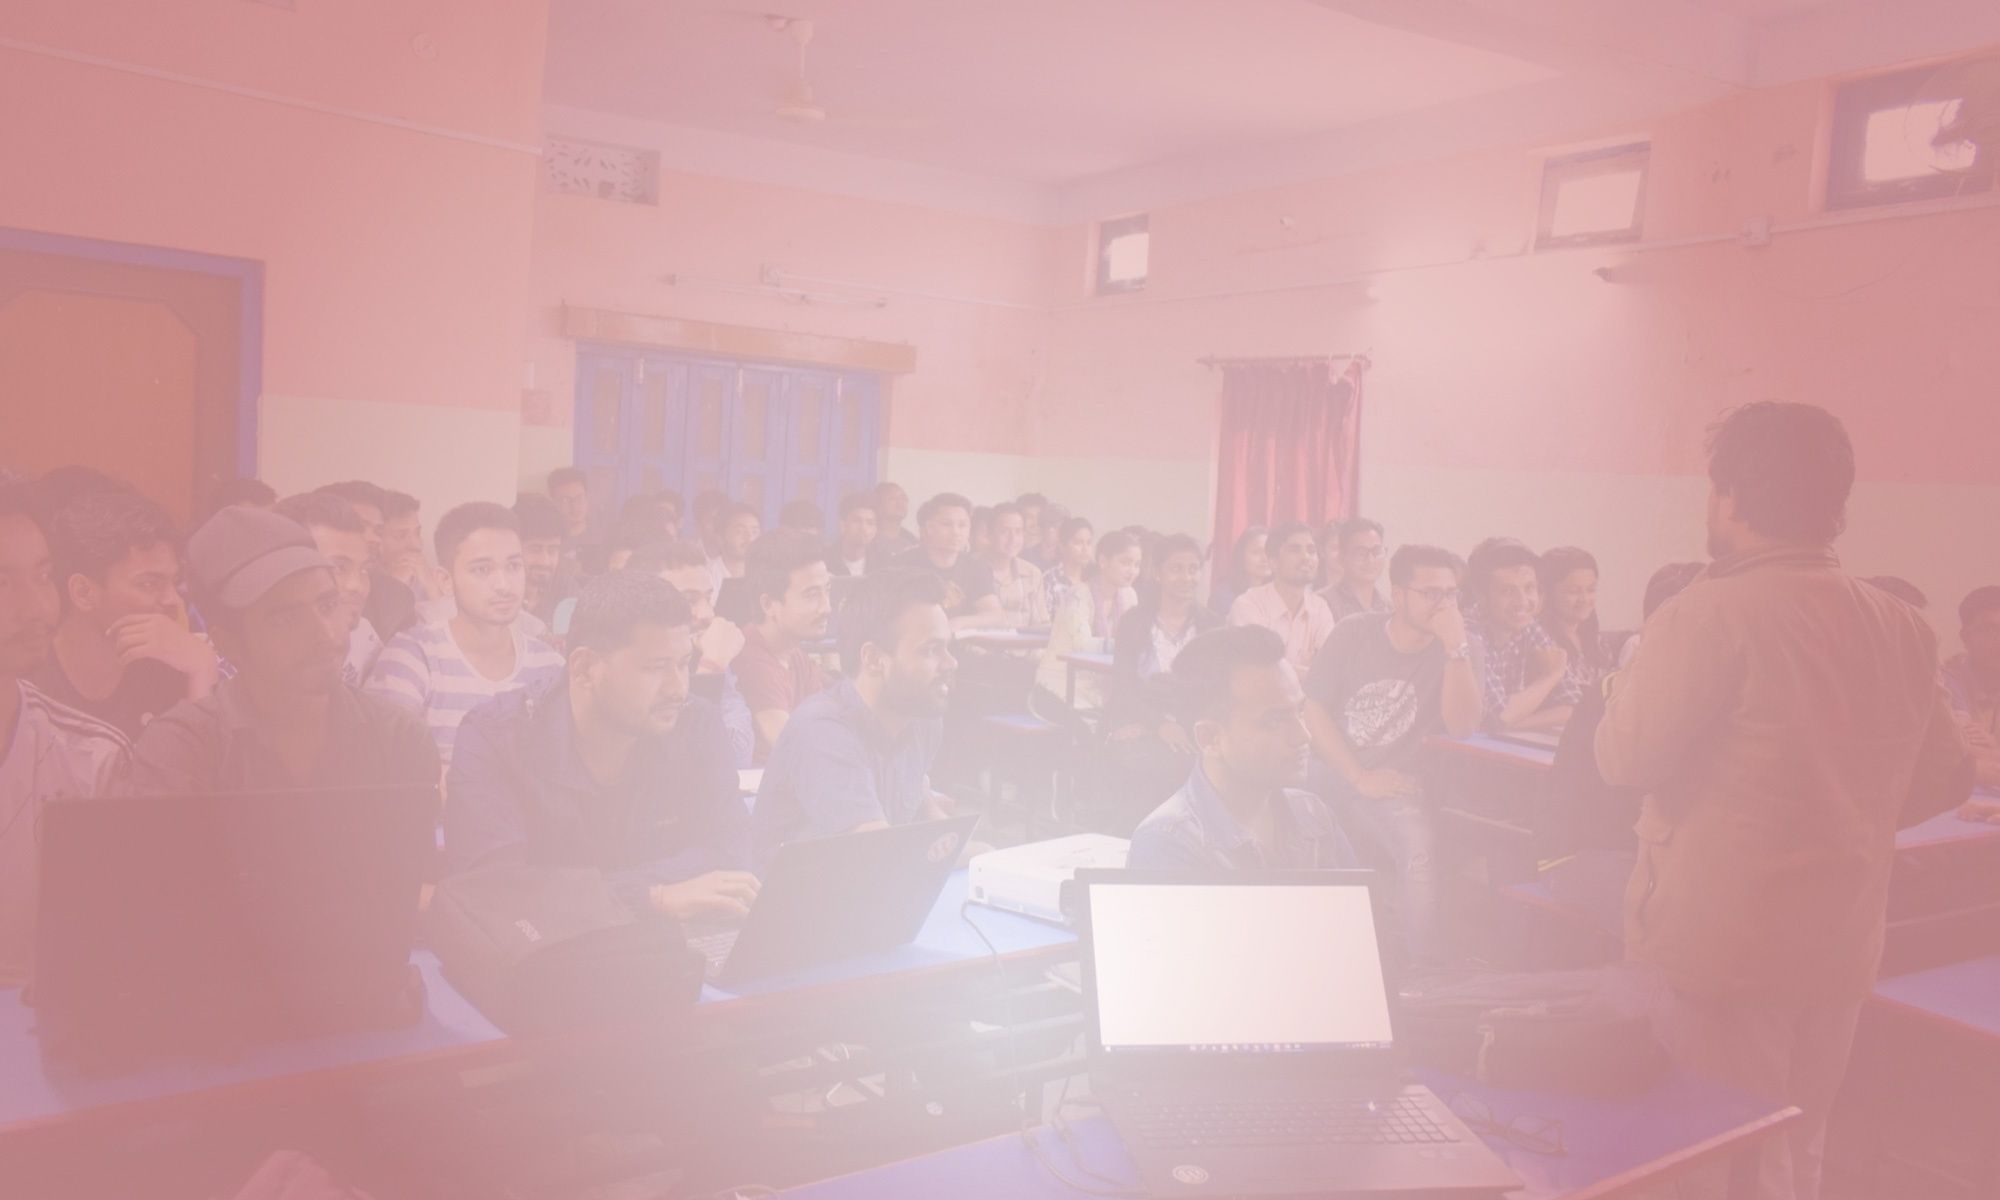 WordCamp Biratnagar 2018 – December 22, Biratnagar, Nepal